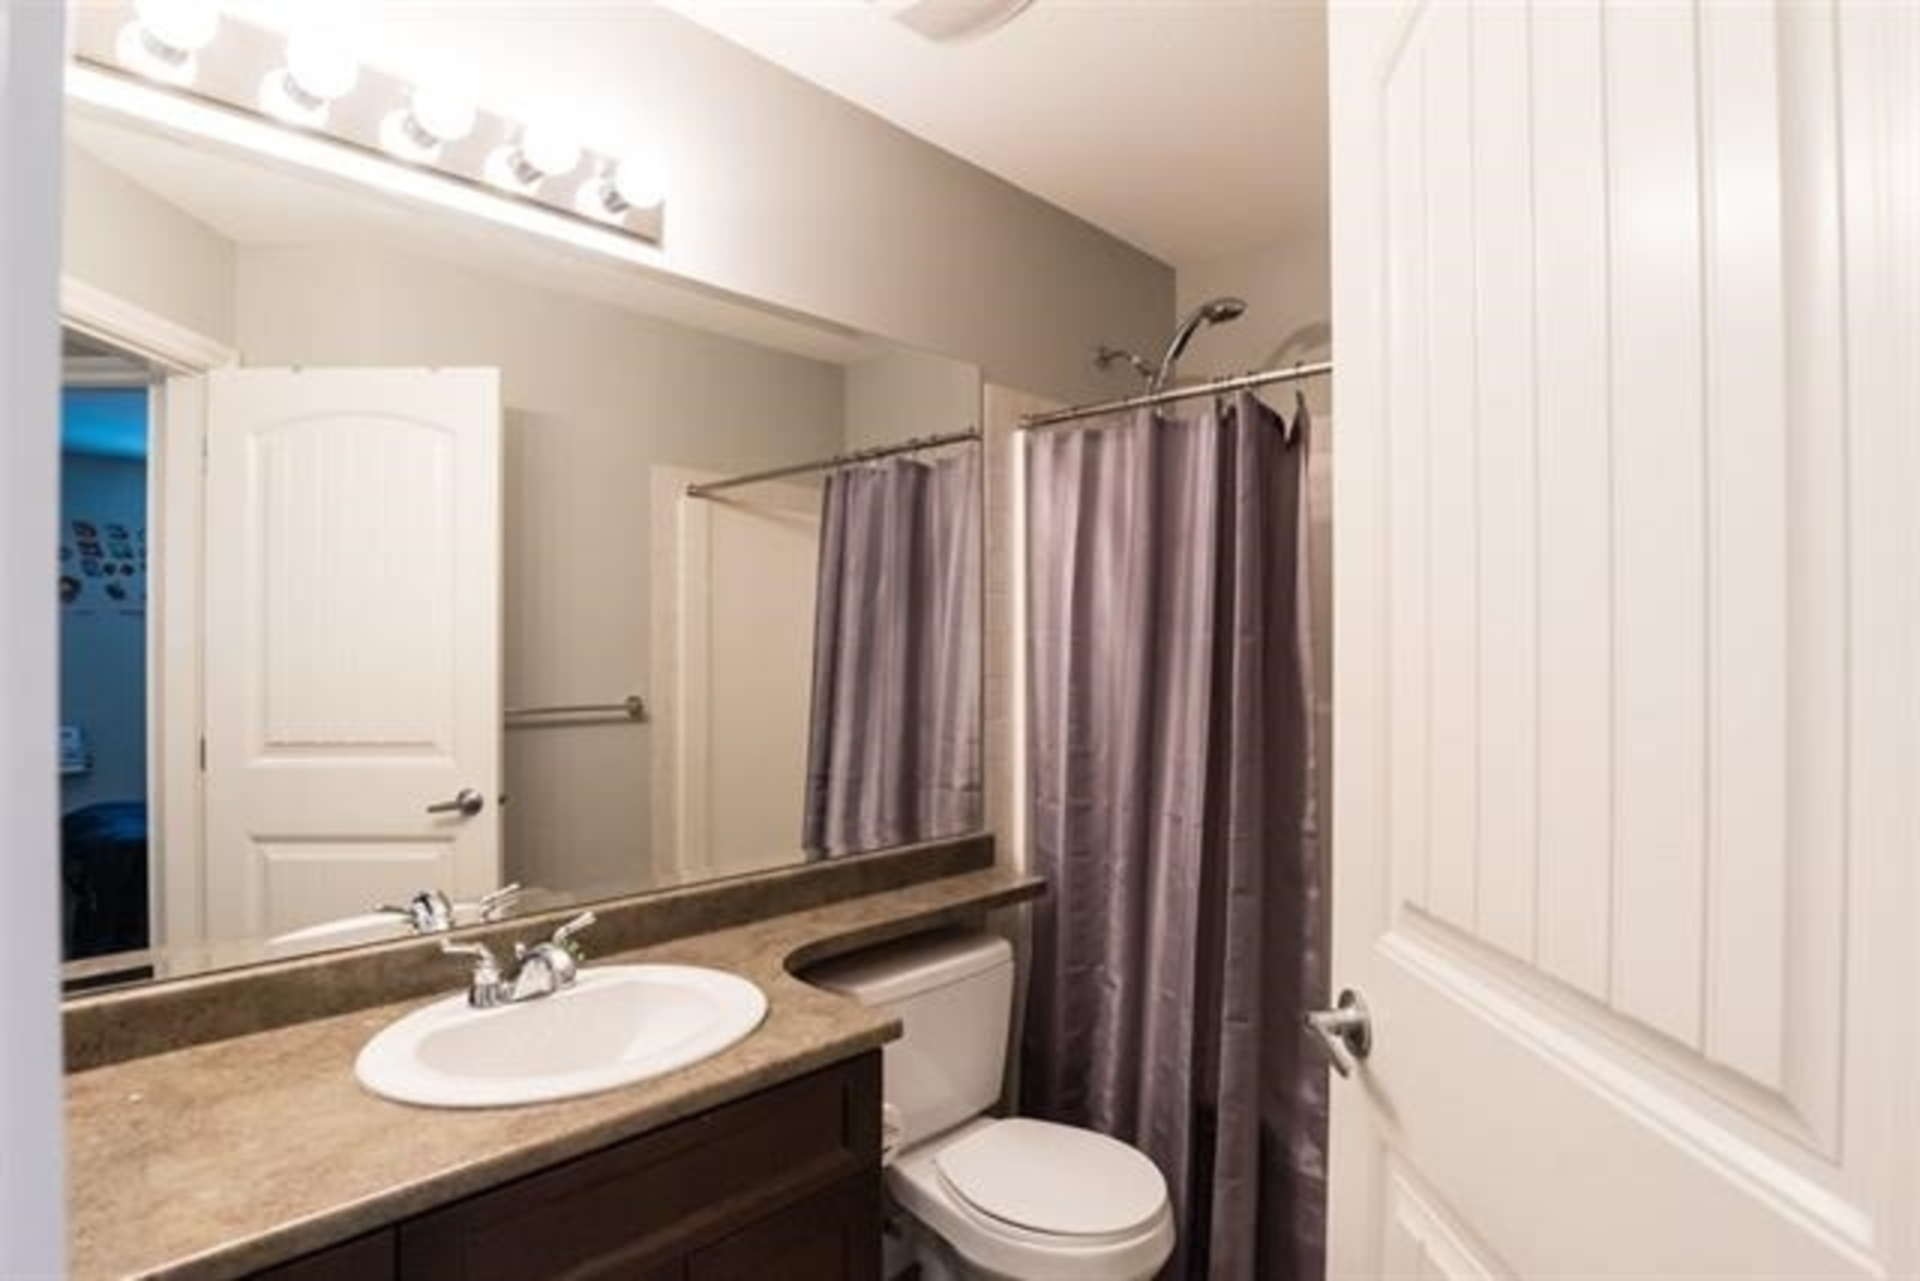 7039-180-street-cloverdale-bc-cloverdale-14 at 7039 180 Street, Cloverdale BC, Cloverdale